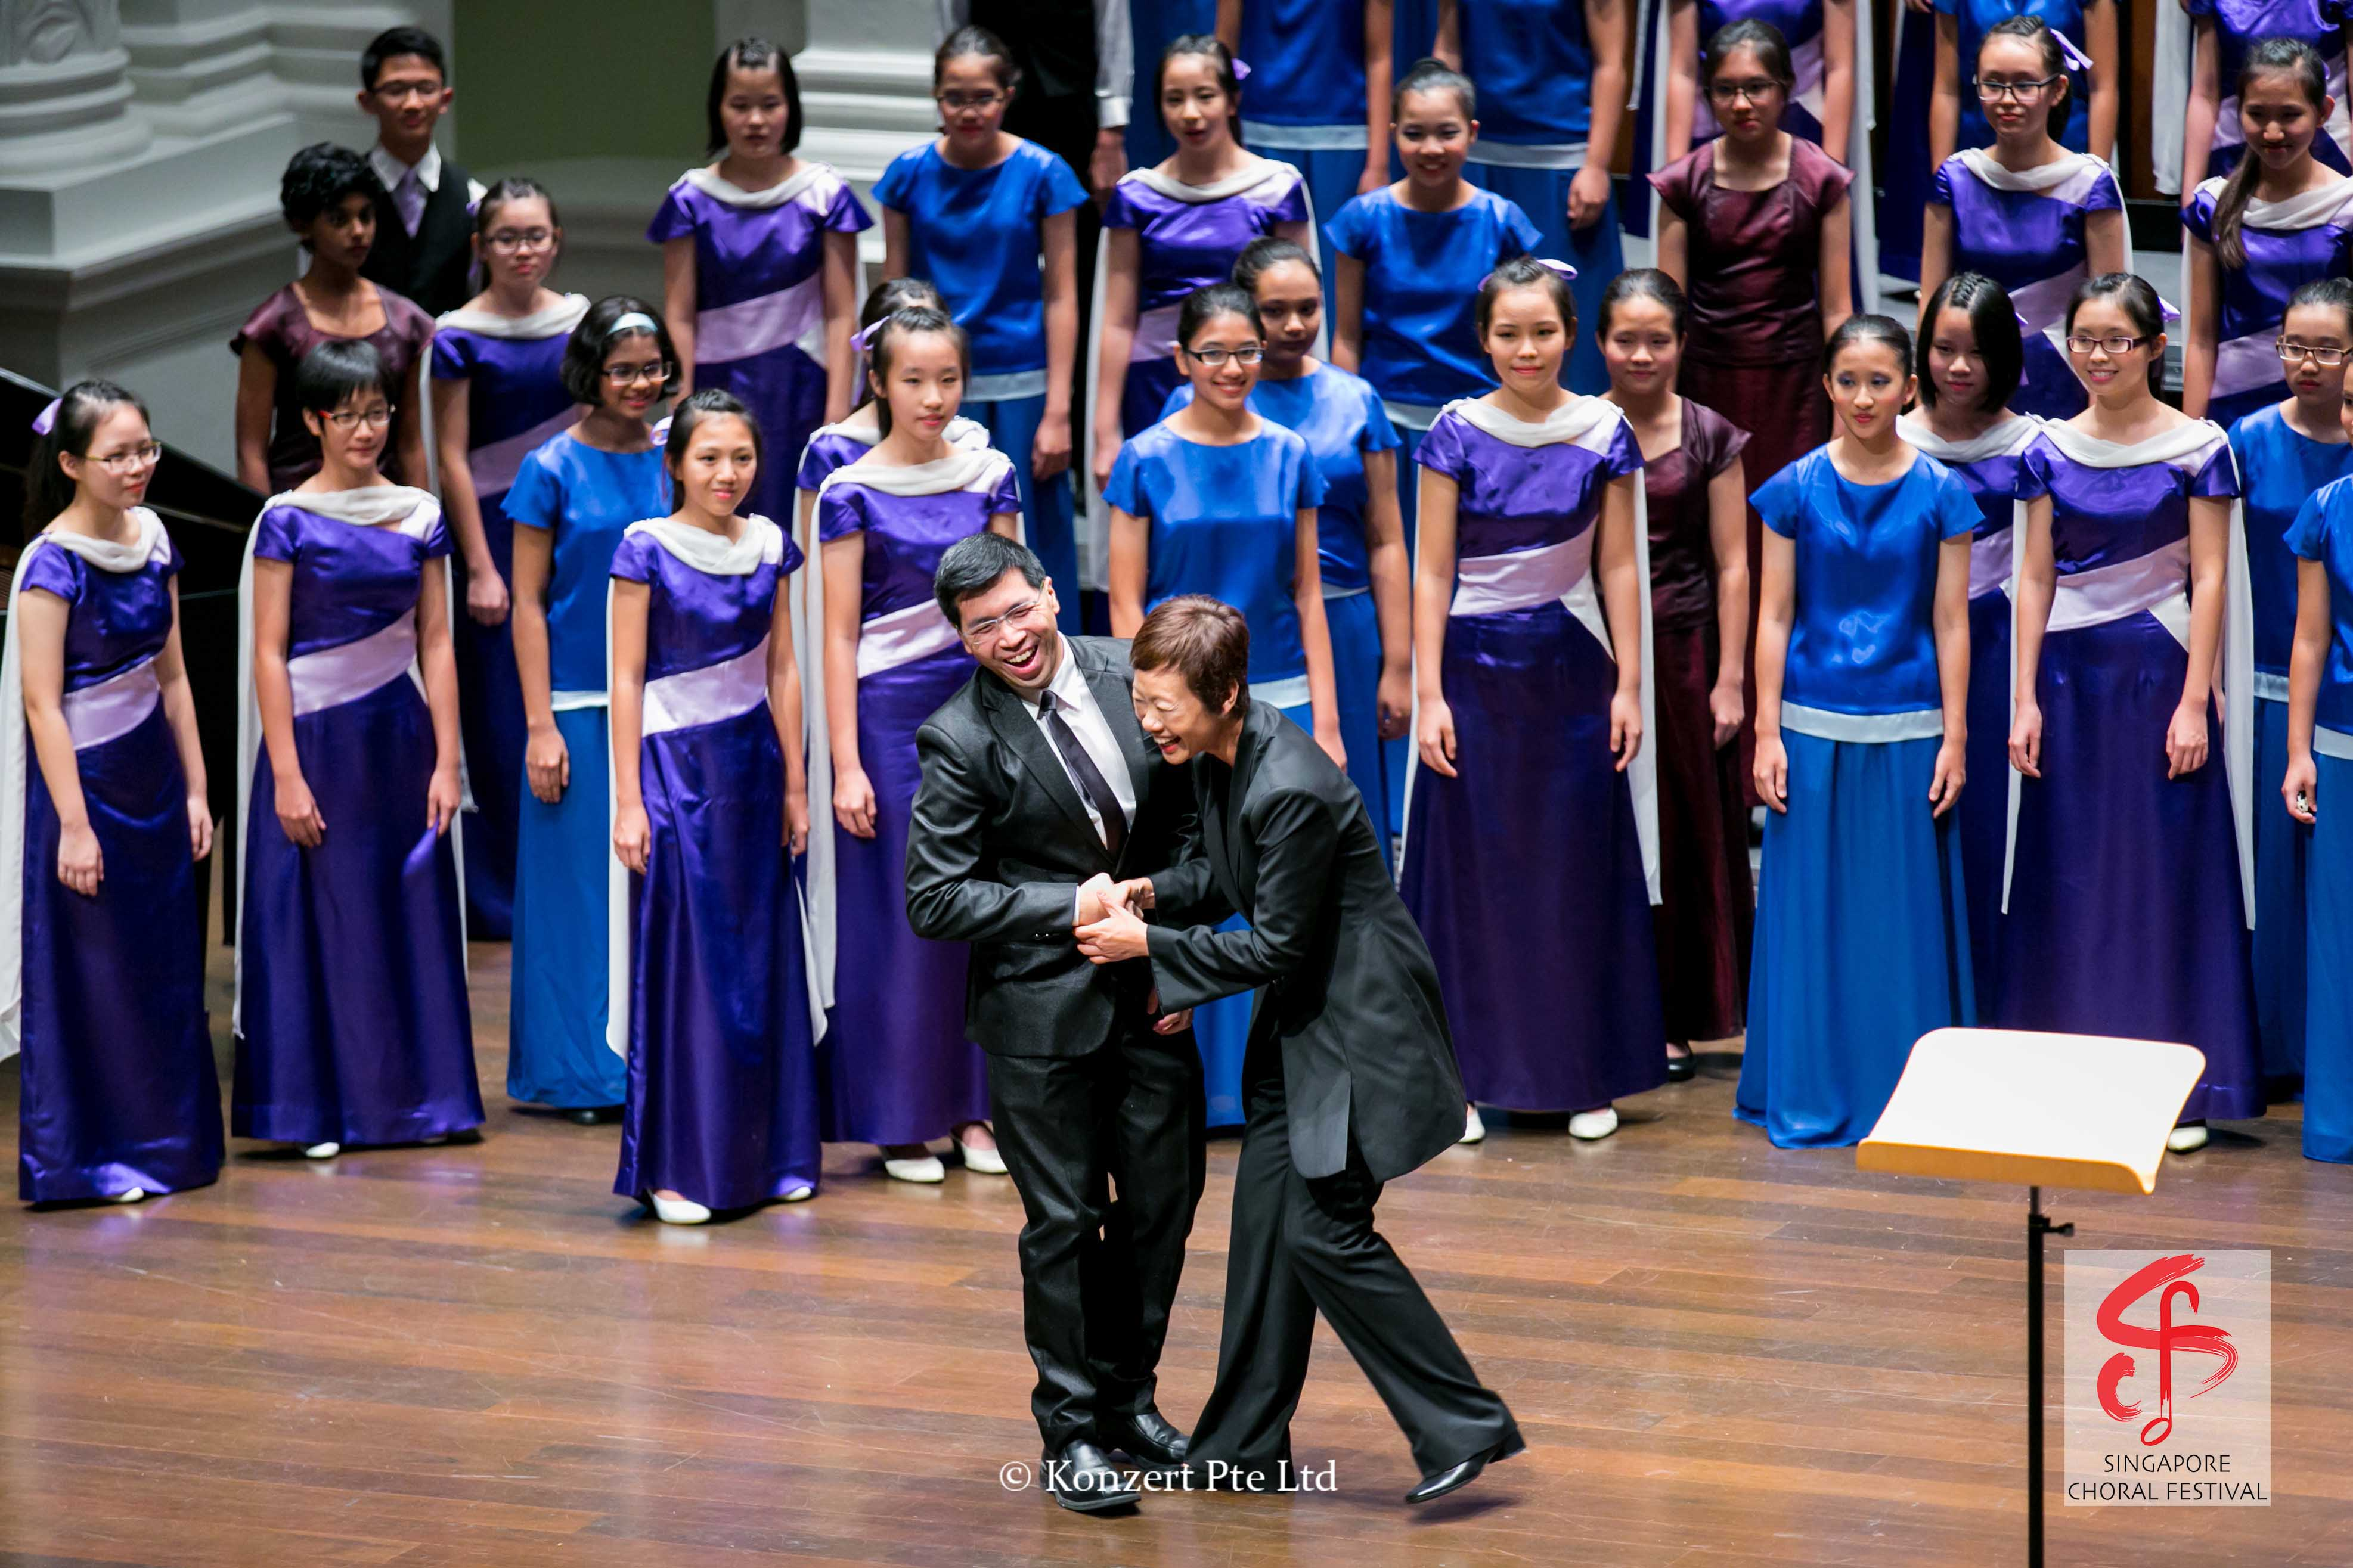 Singapore Choral Festival 7-8-15 (286).jpg